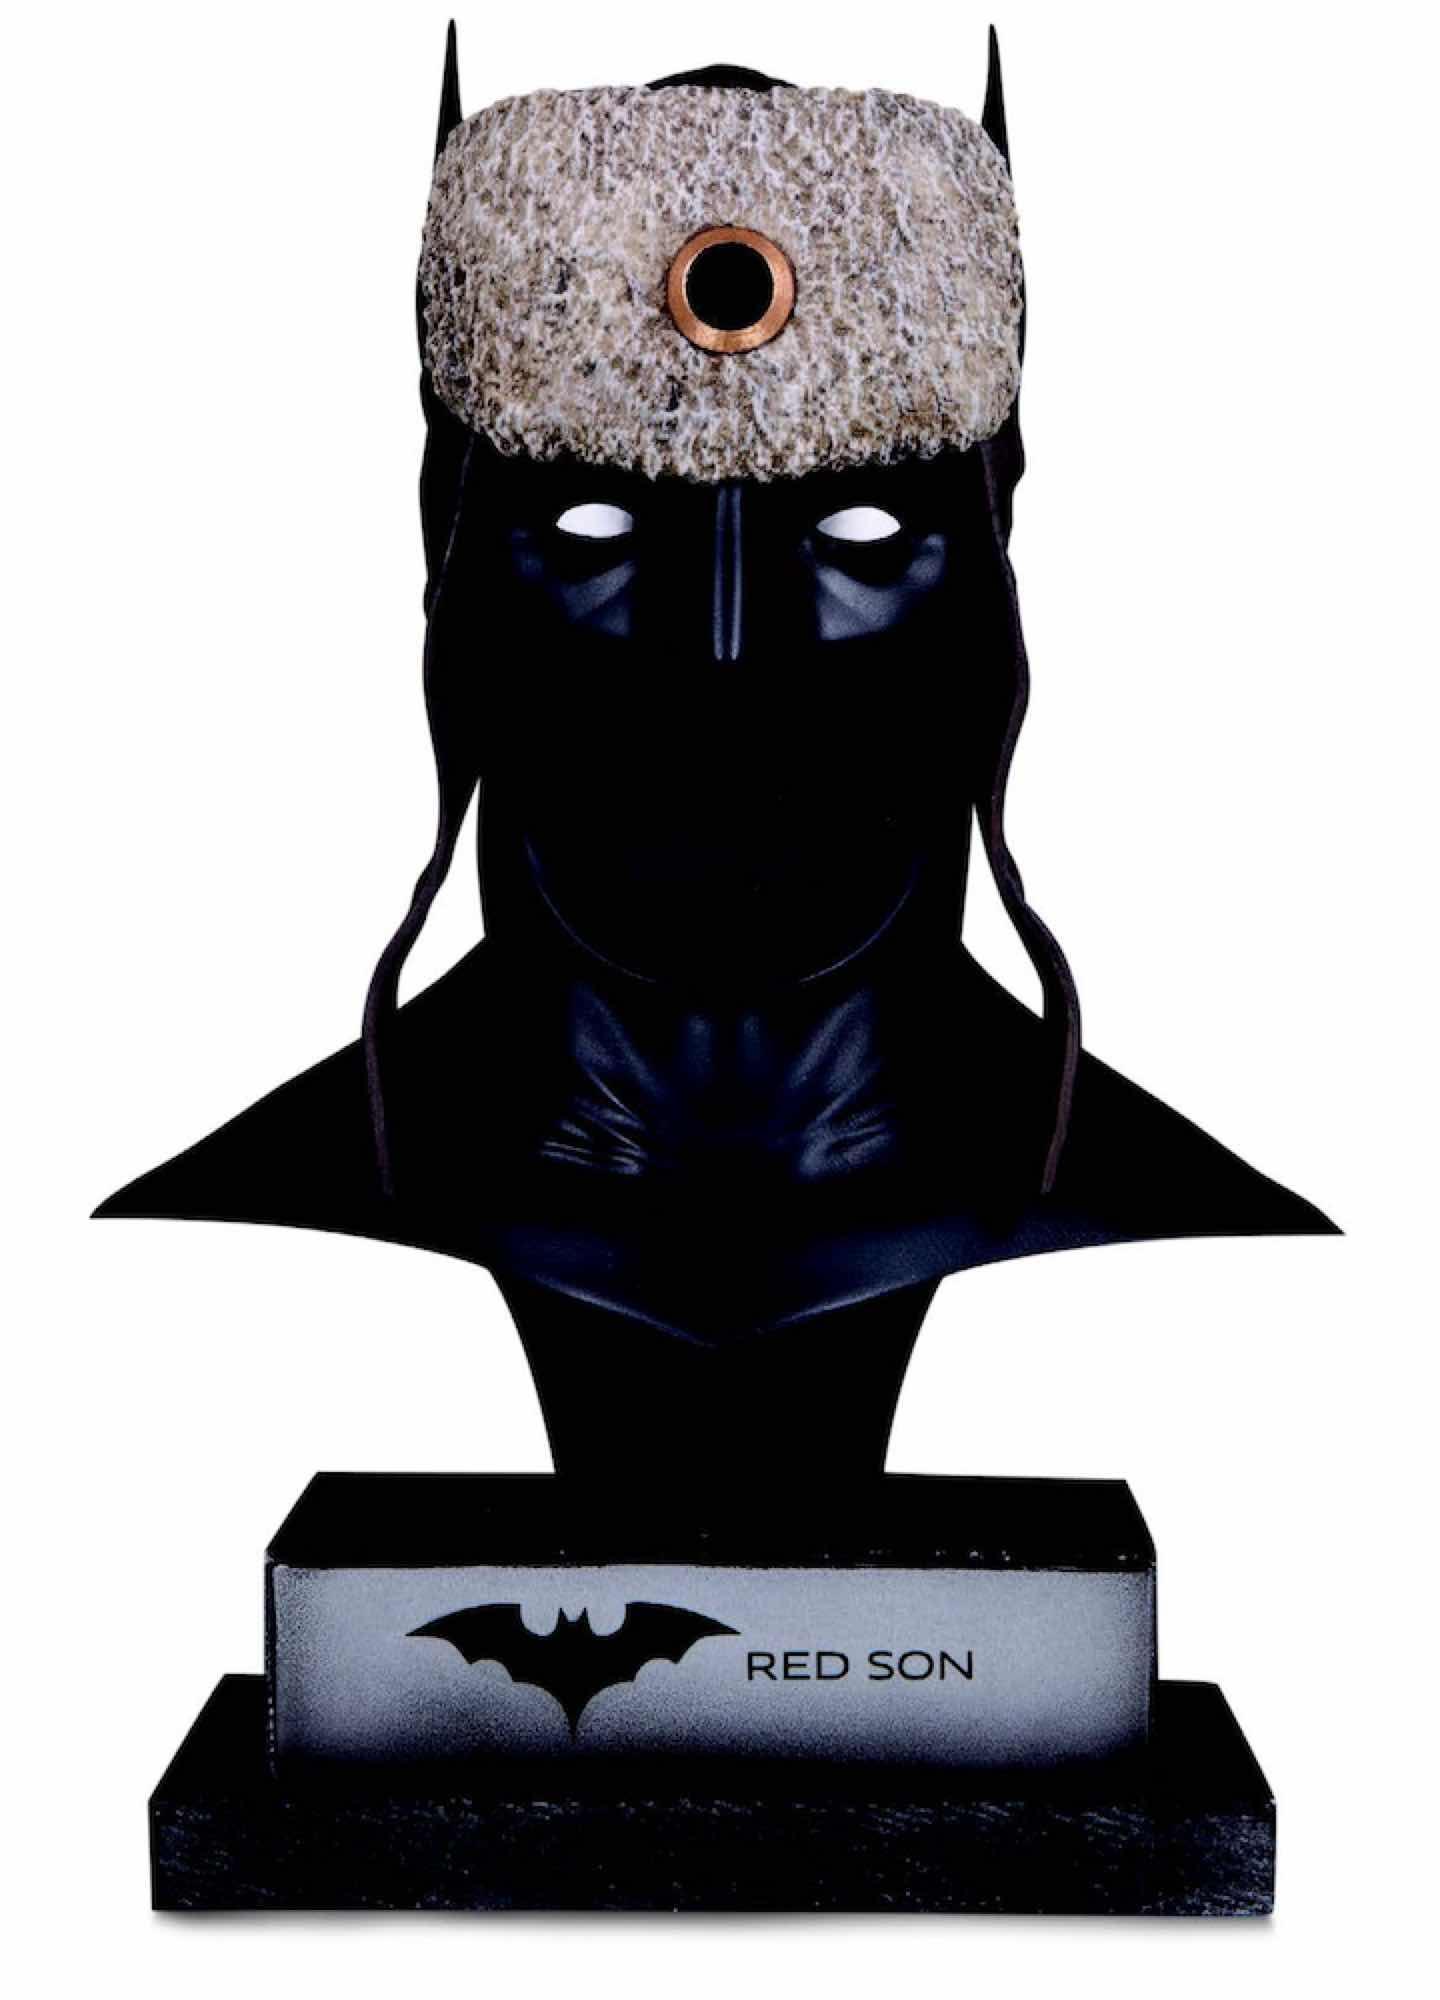 CAPUCHA BATMAN PROP REPLICA 23 CM SUPERMAN RED SON DC GALLERY